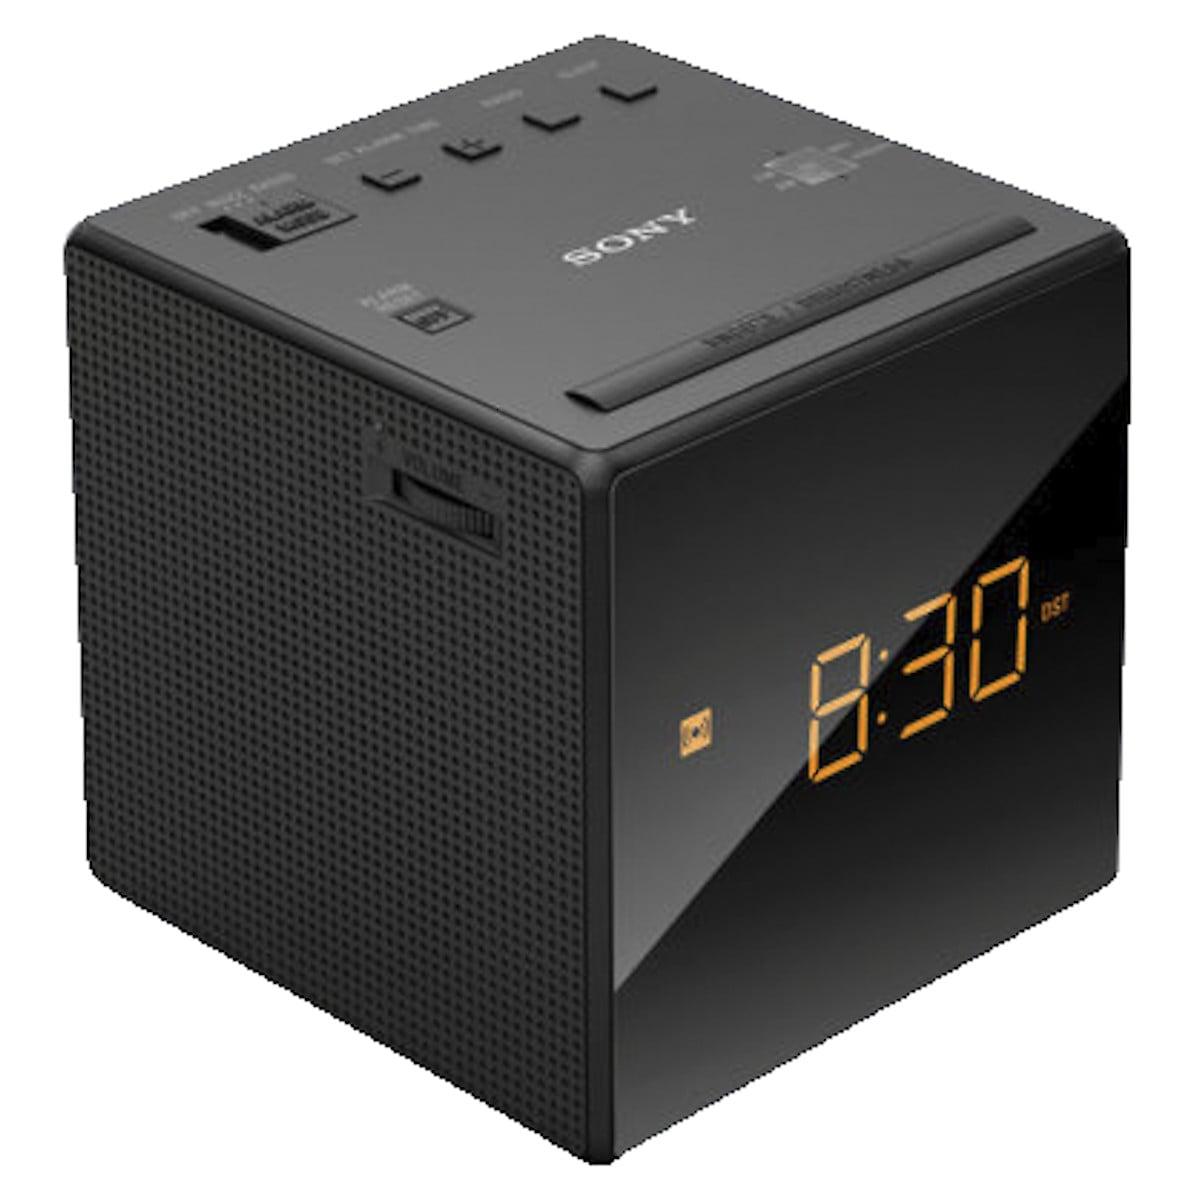 Klockradio Sony ICF-C1